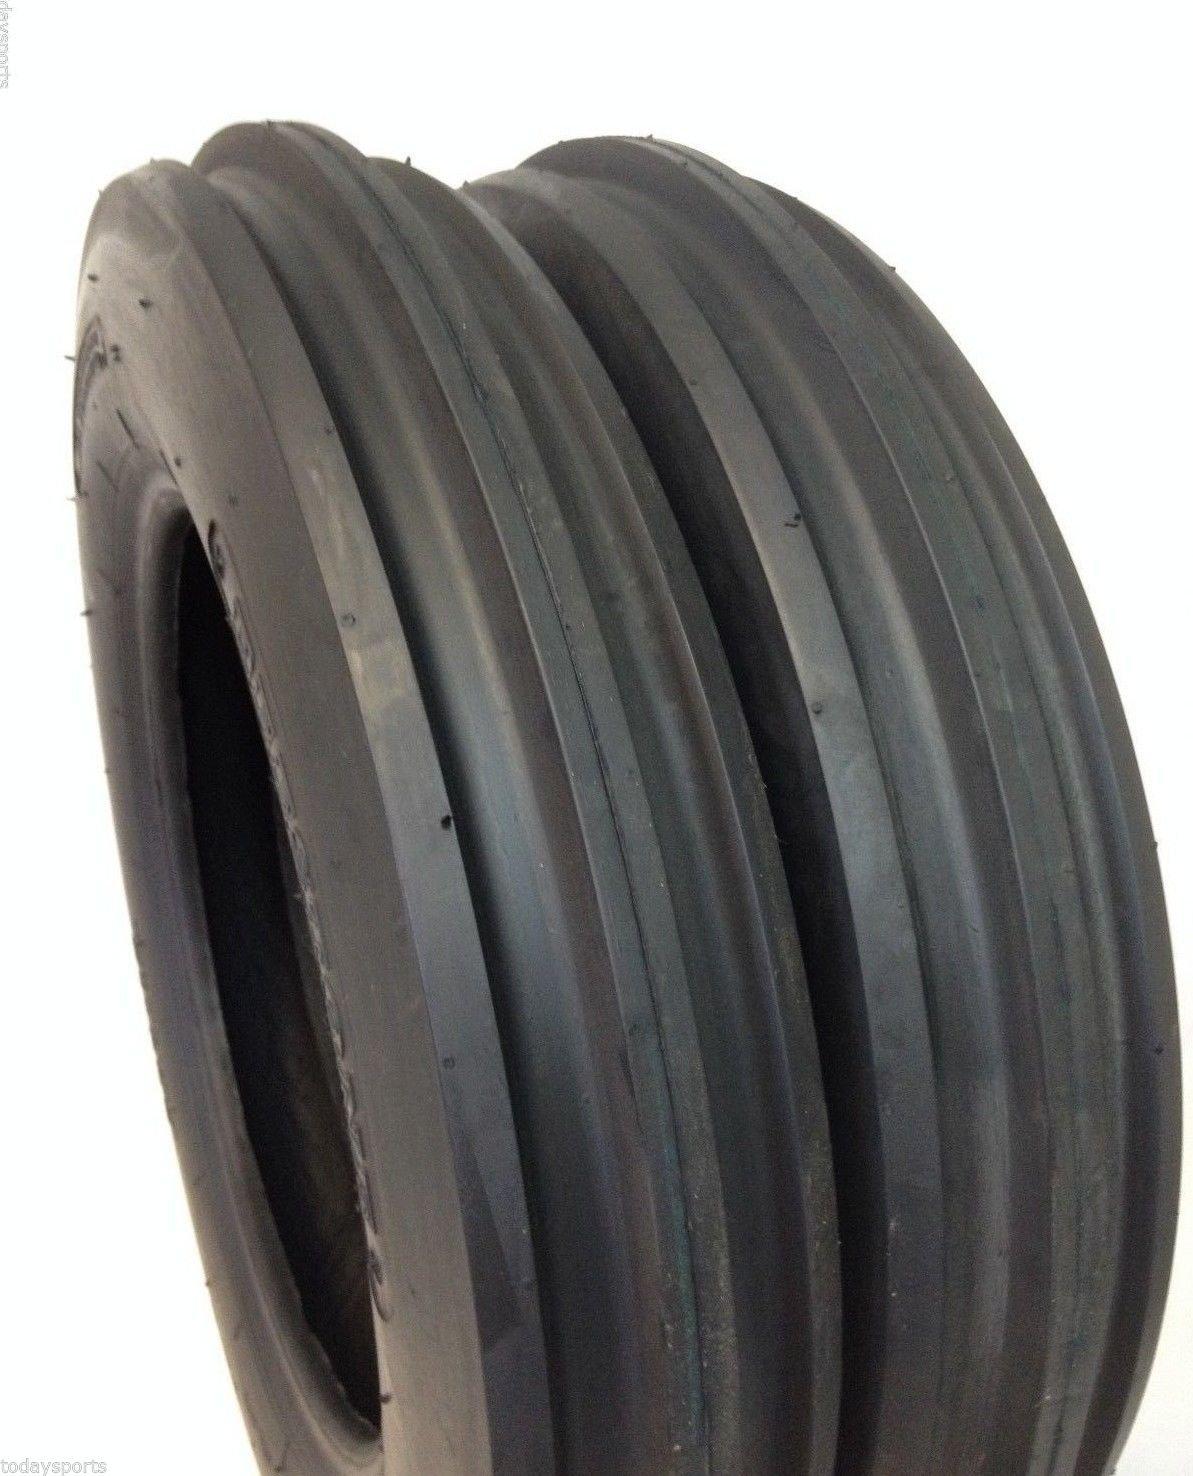 Two 5.00-15 Rib Tractor Tires with Tubes 500-15 Three Rib